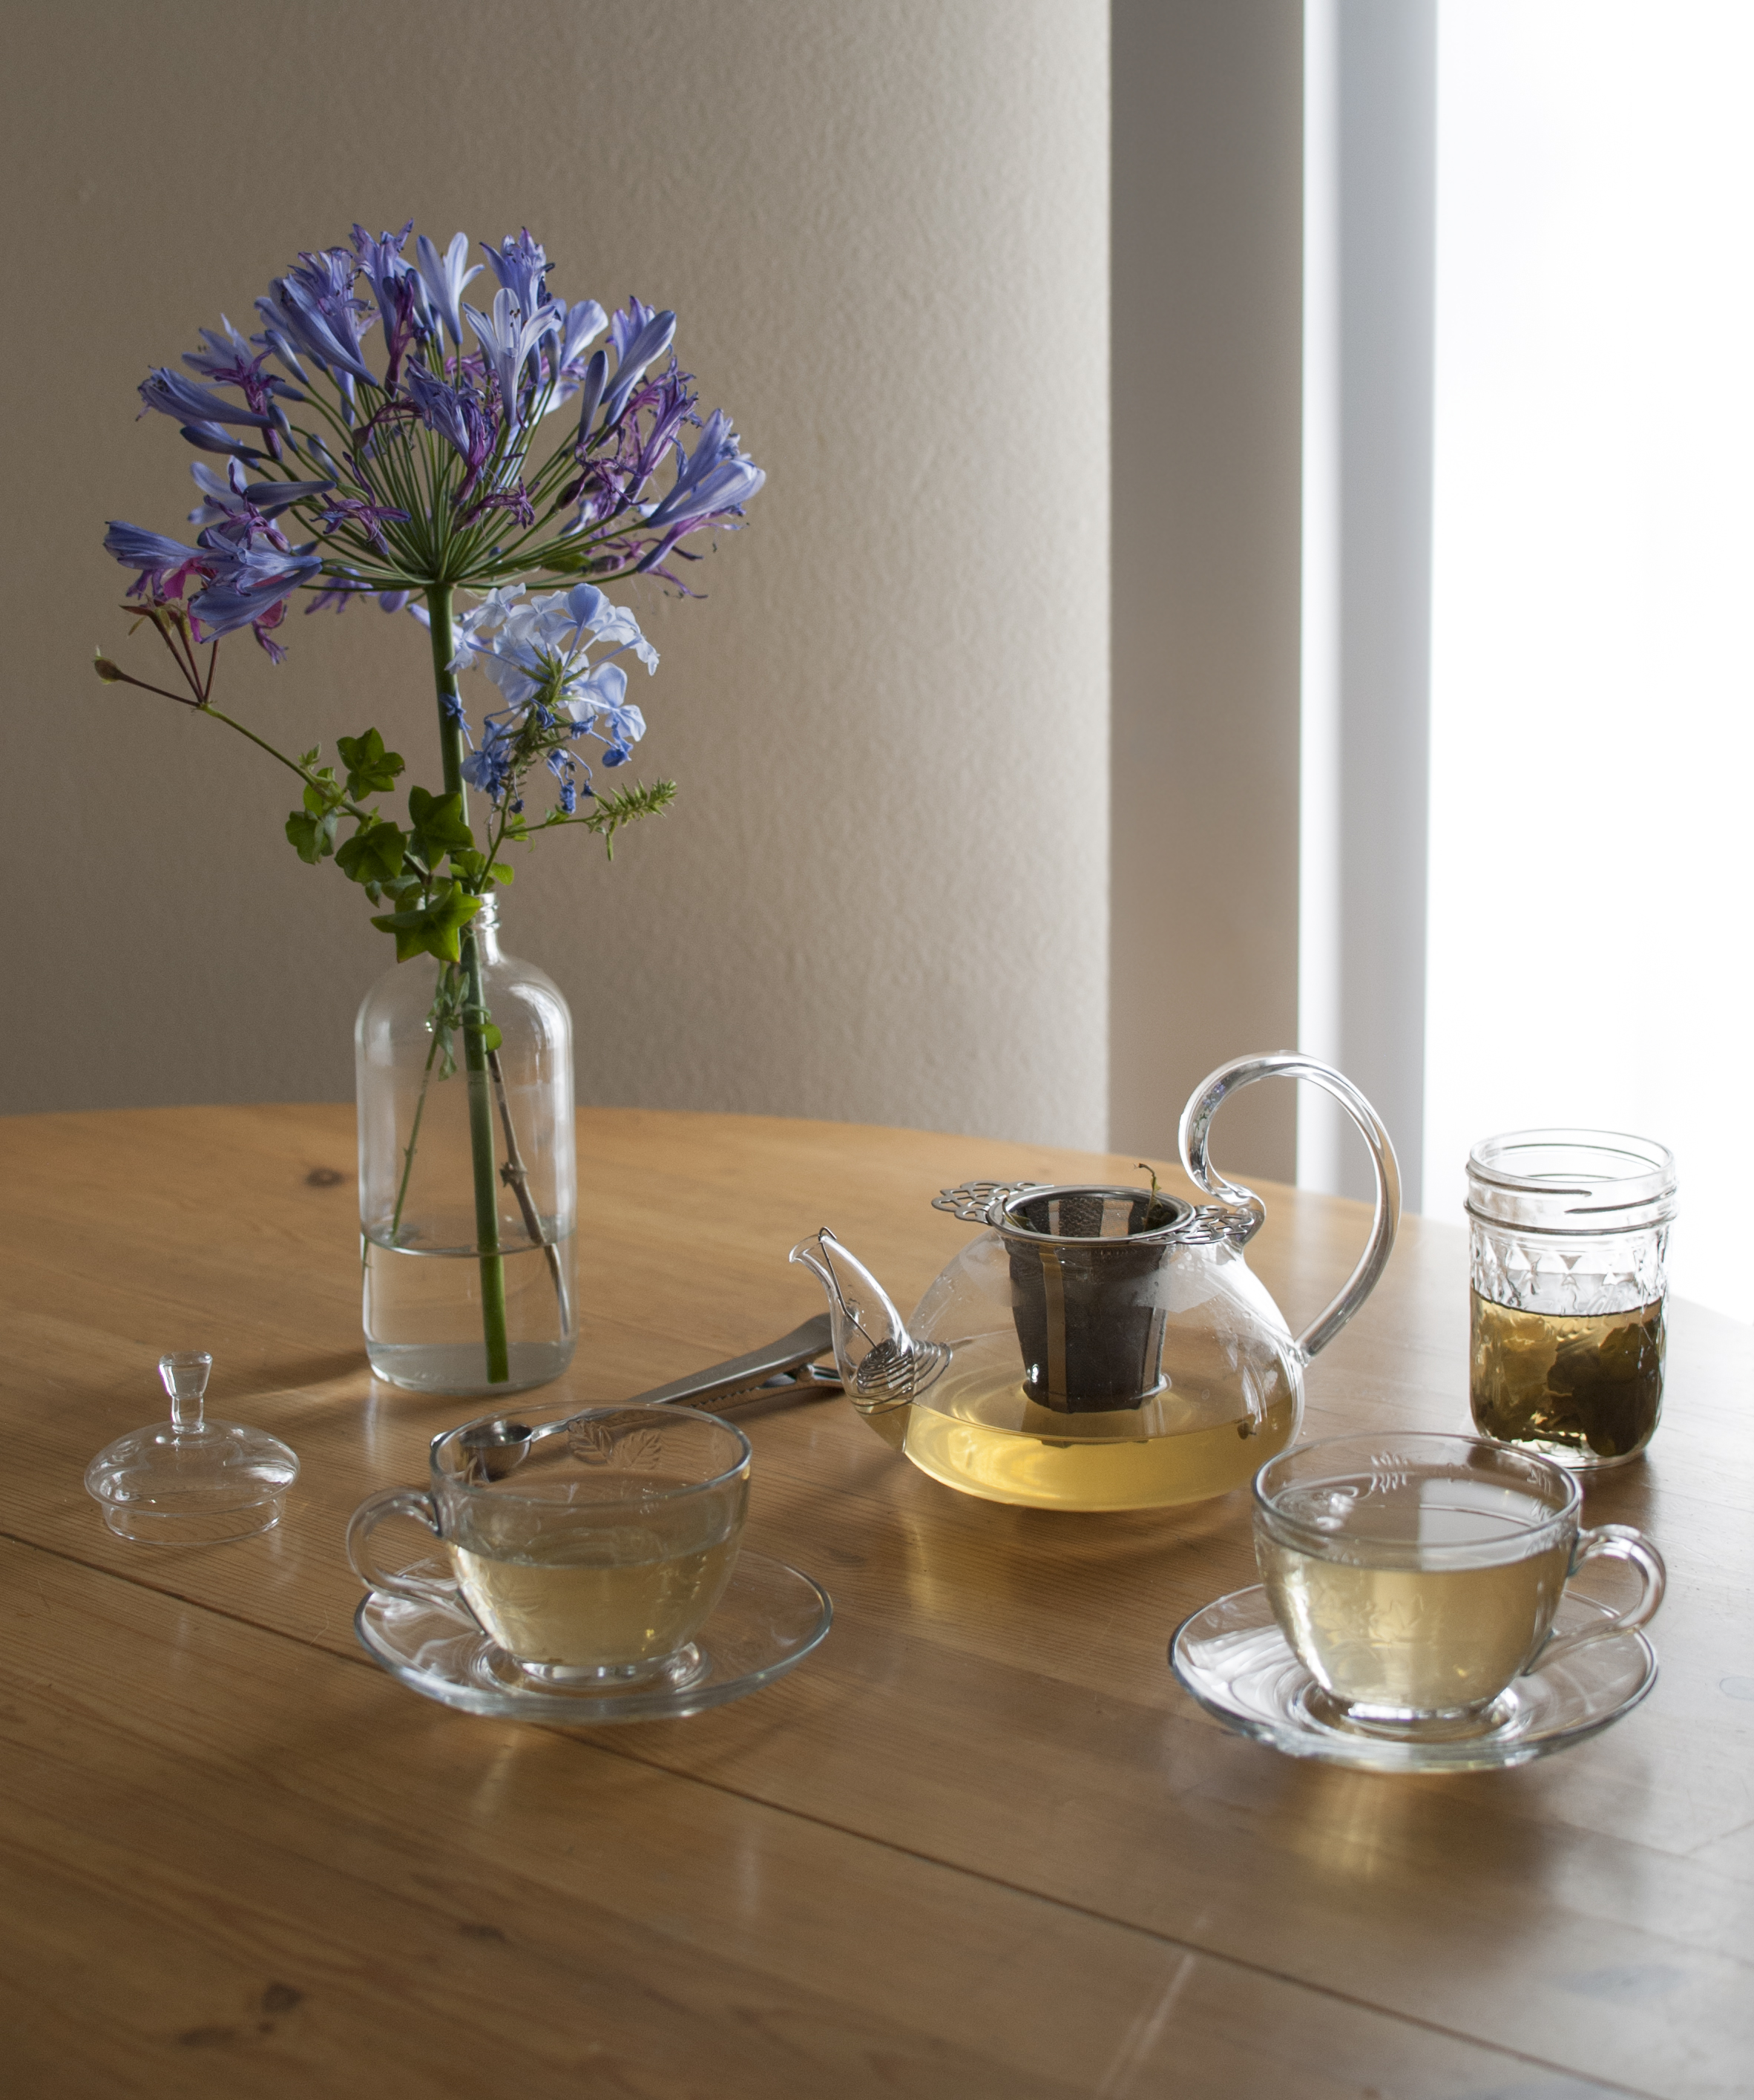 linden and lime kaffir tea